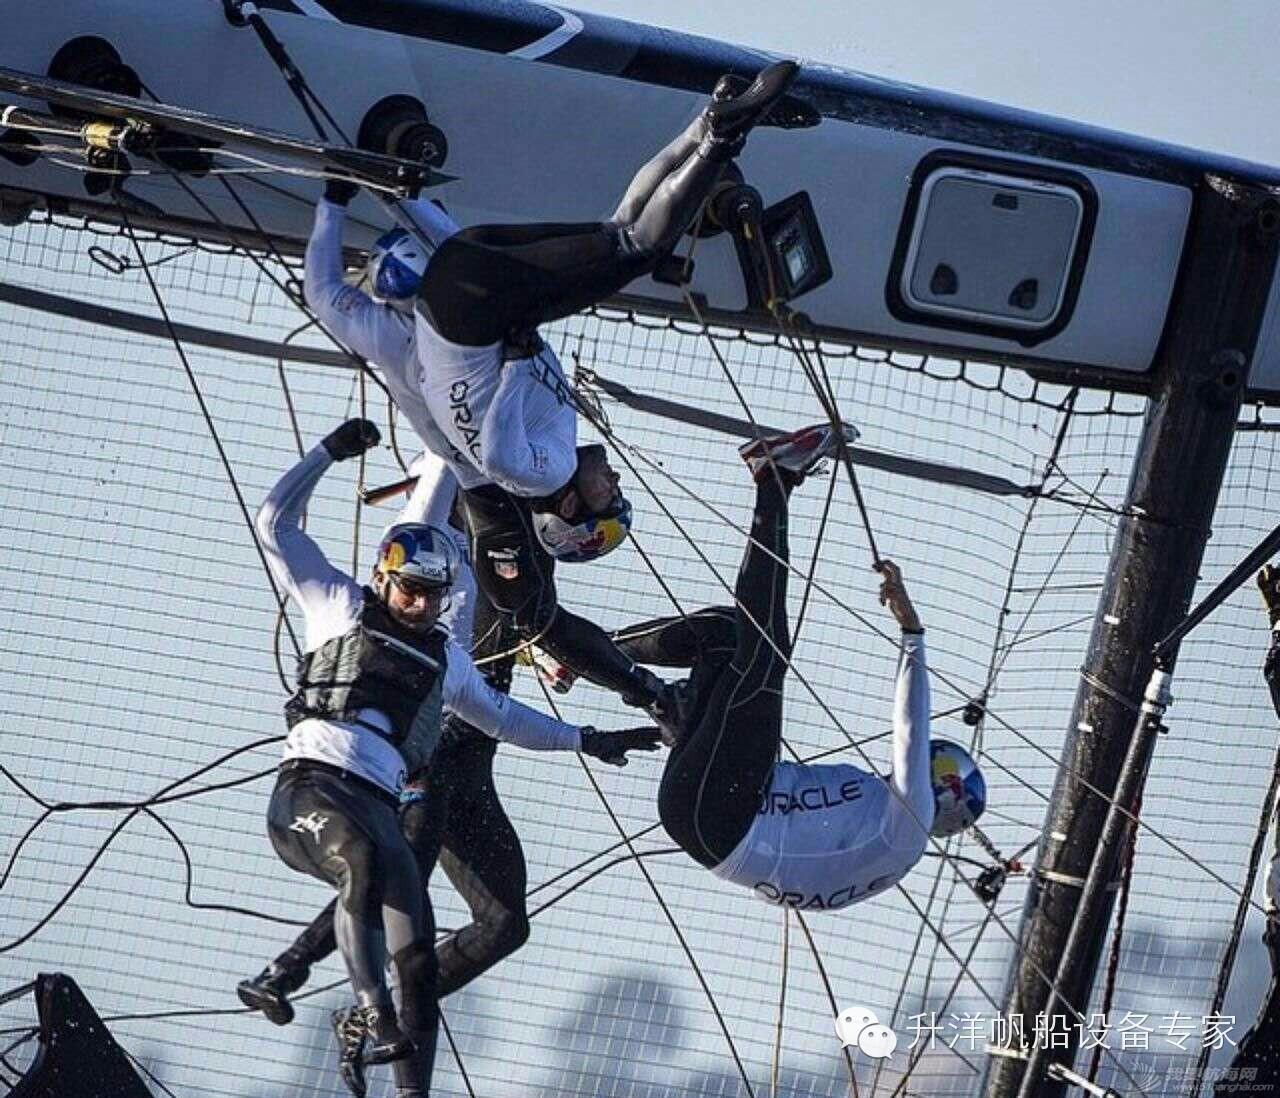 Extreme Sailing 极限青岛队,极限装备! bb7e2a08249baeb974b0de68a89bf028.jpg